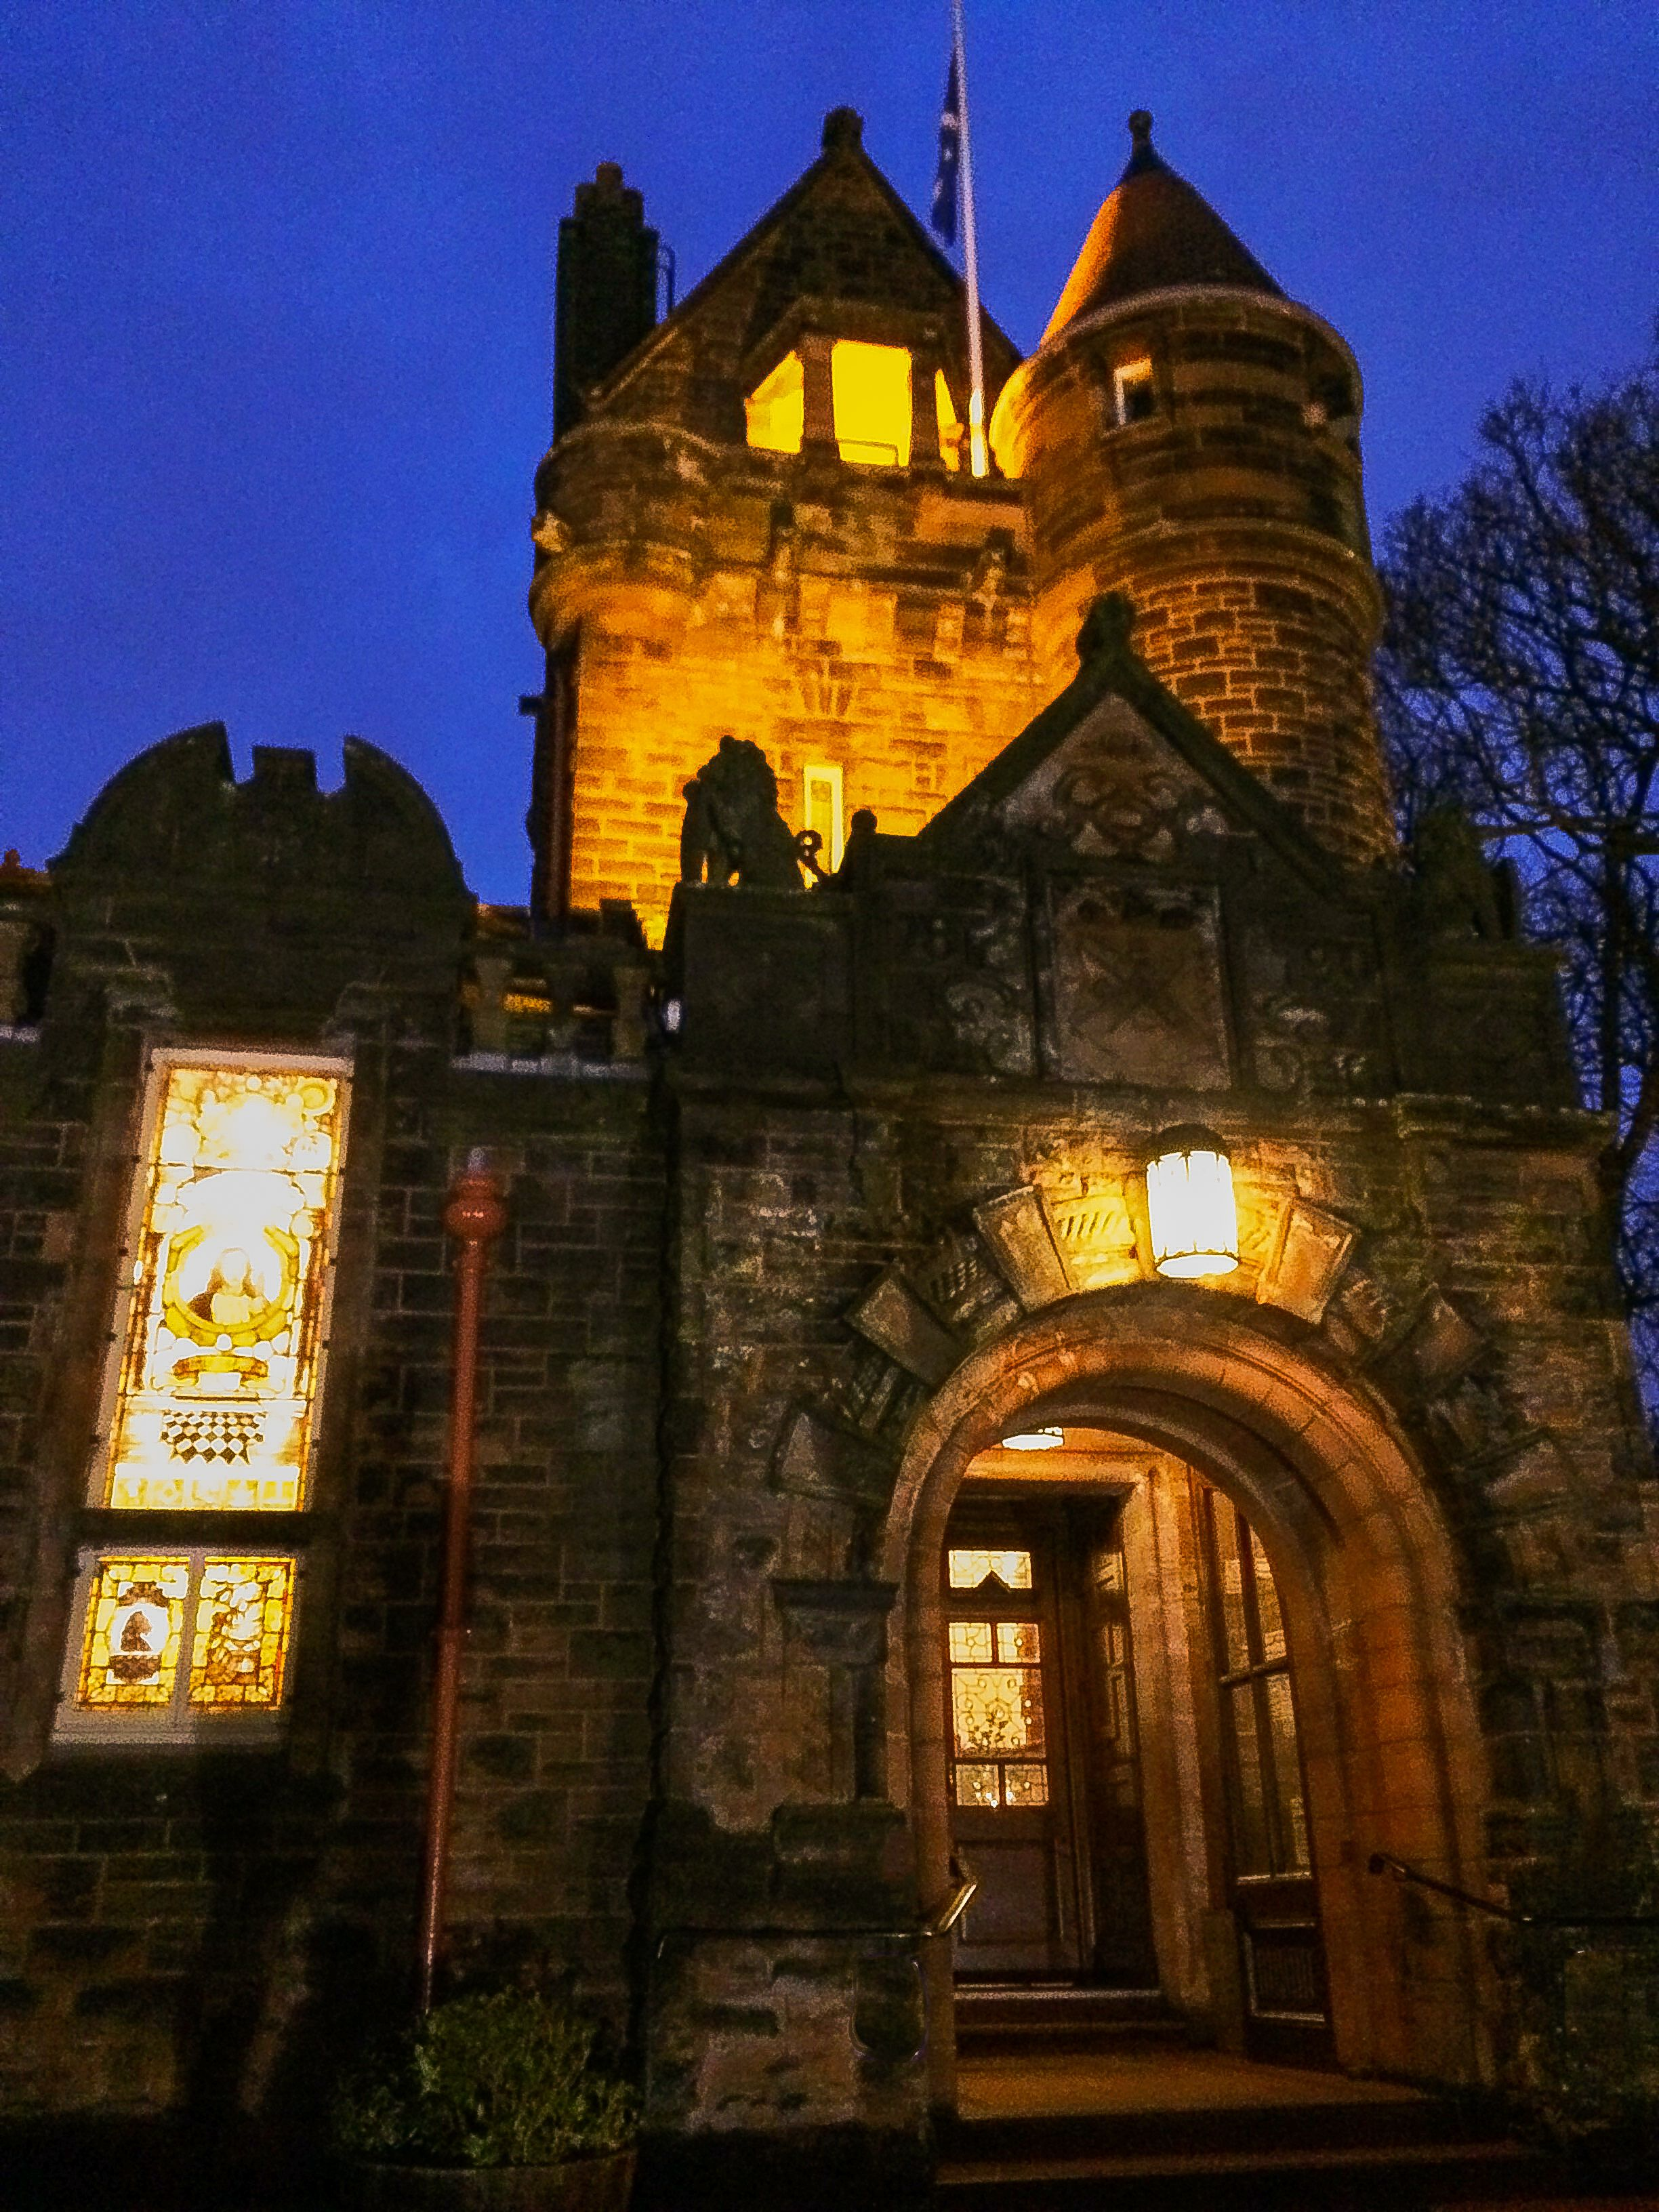 Pollokshields Burgh Hall Wedding Venue Glasgow Photo By Floorfillerz